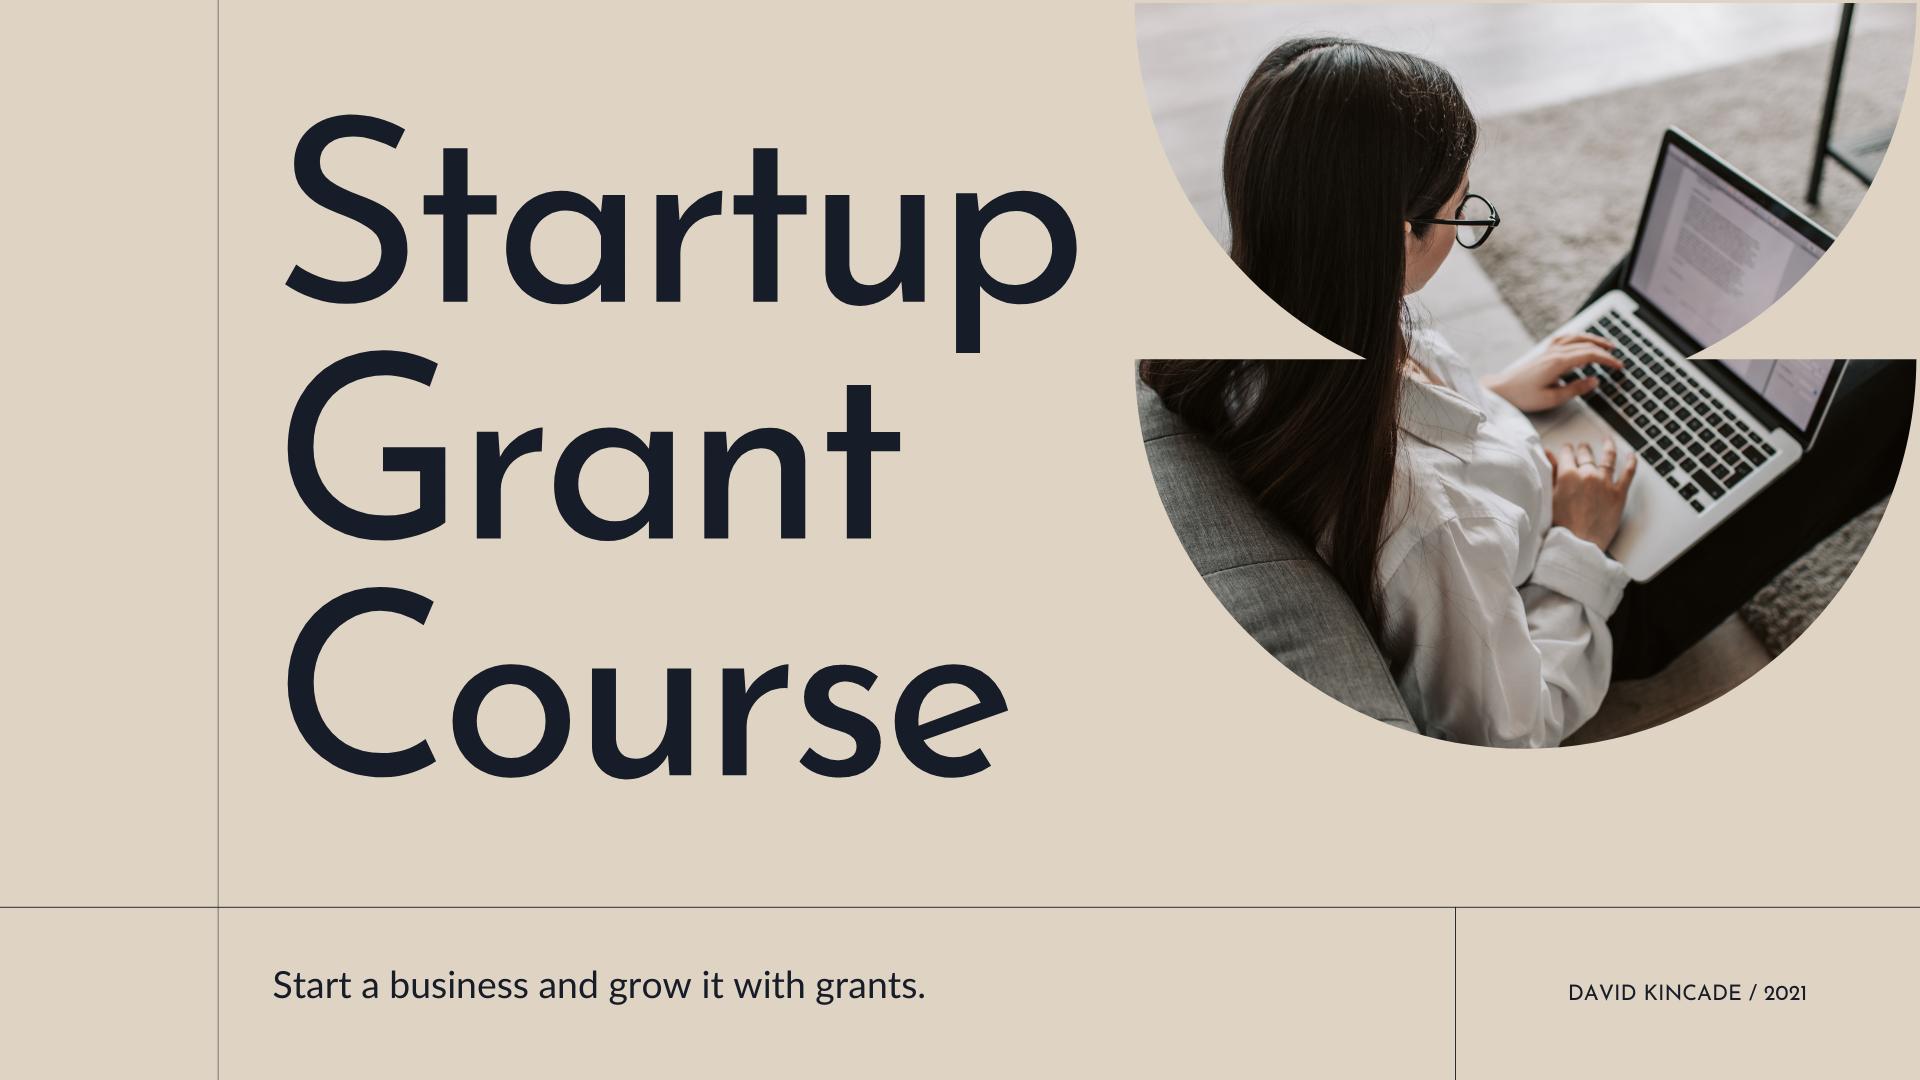 Startup Grant Course